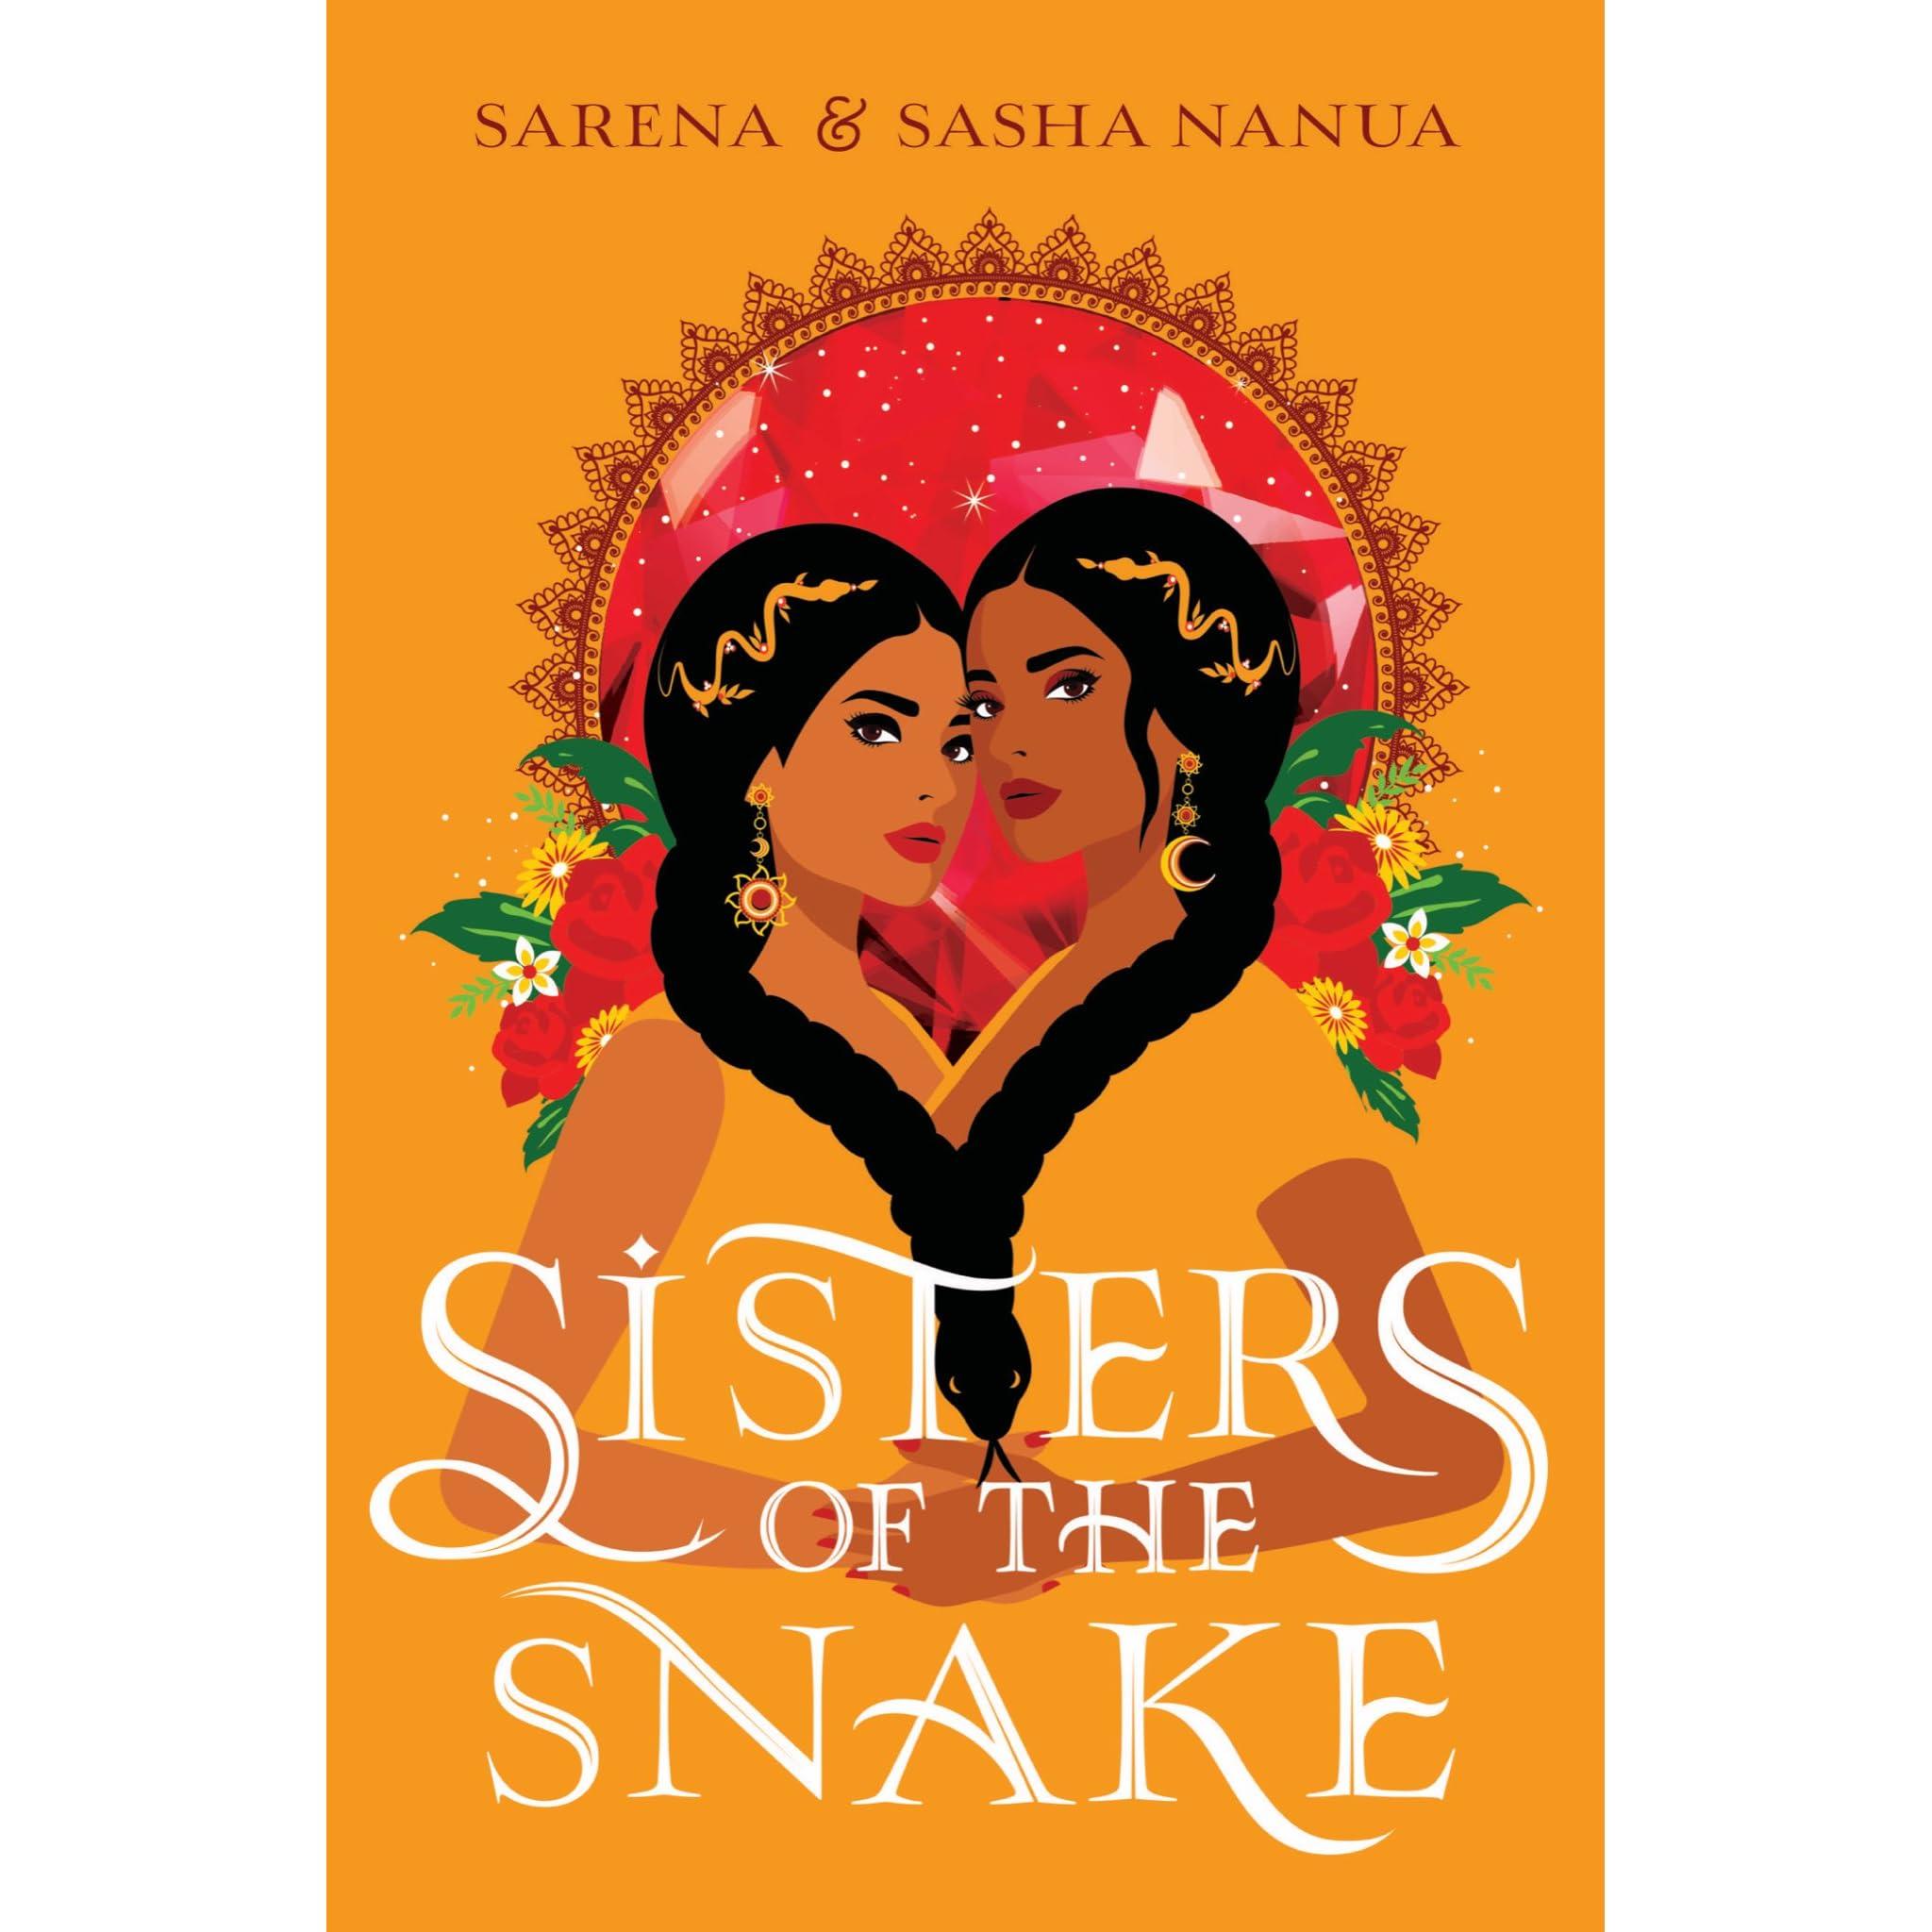 Sisters of the Snake (Ria & Rani #1) by Sasha Nanua